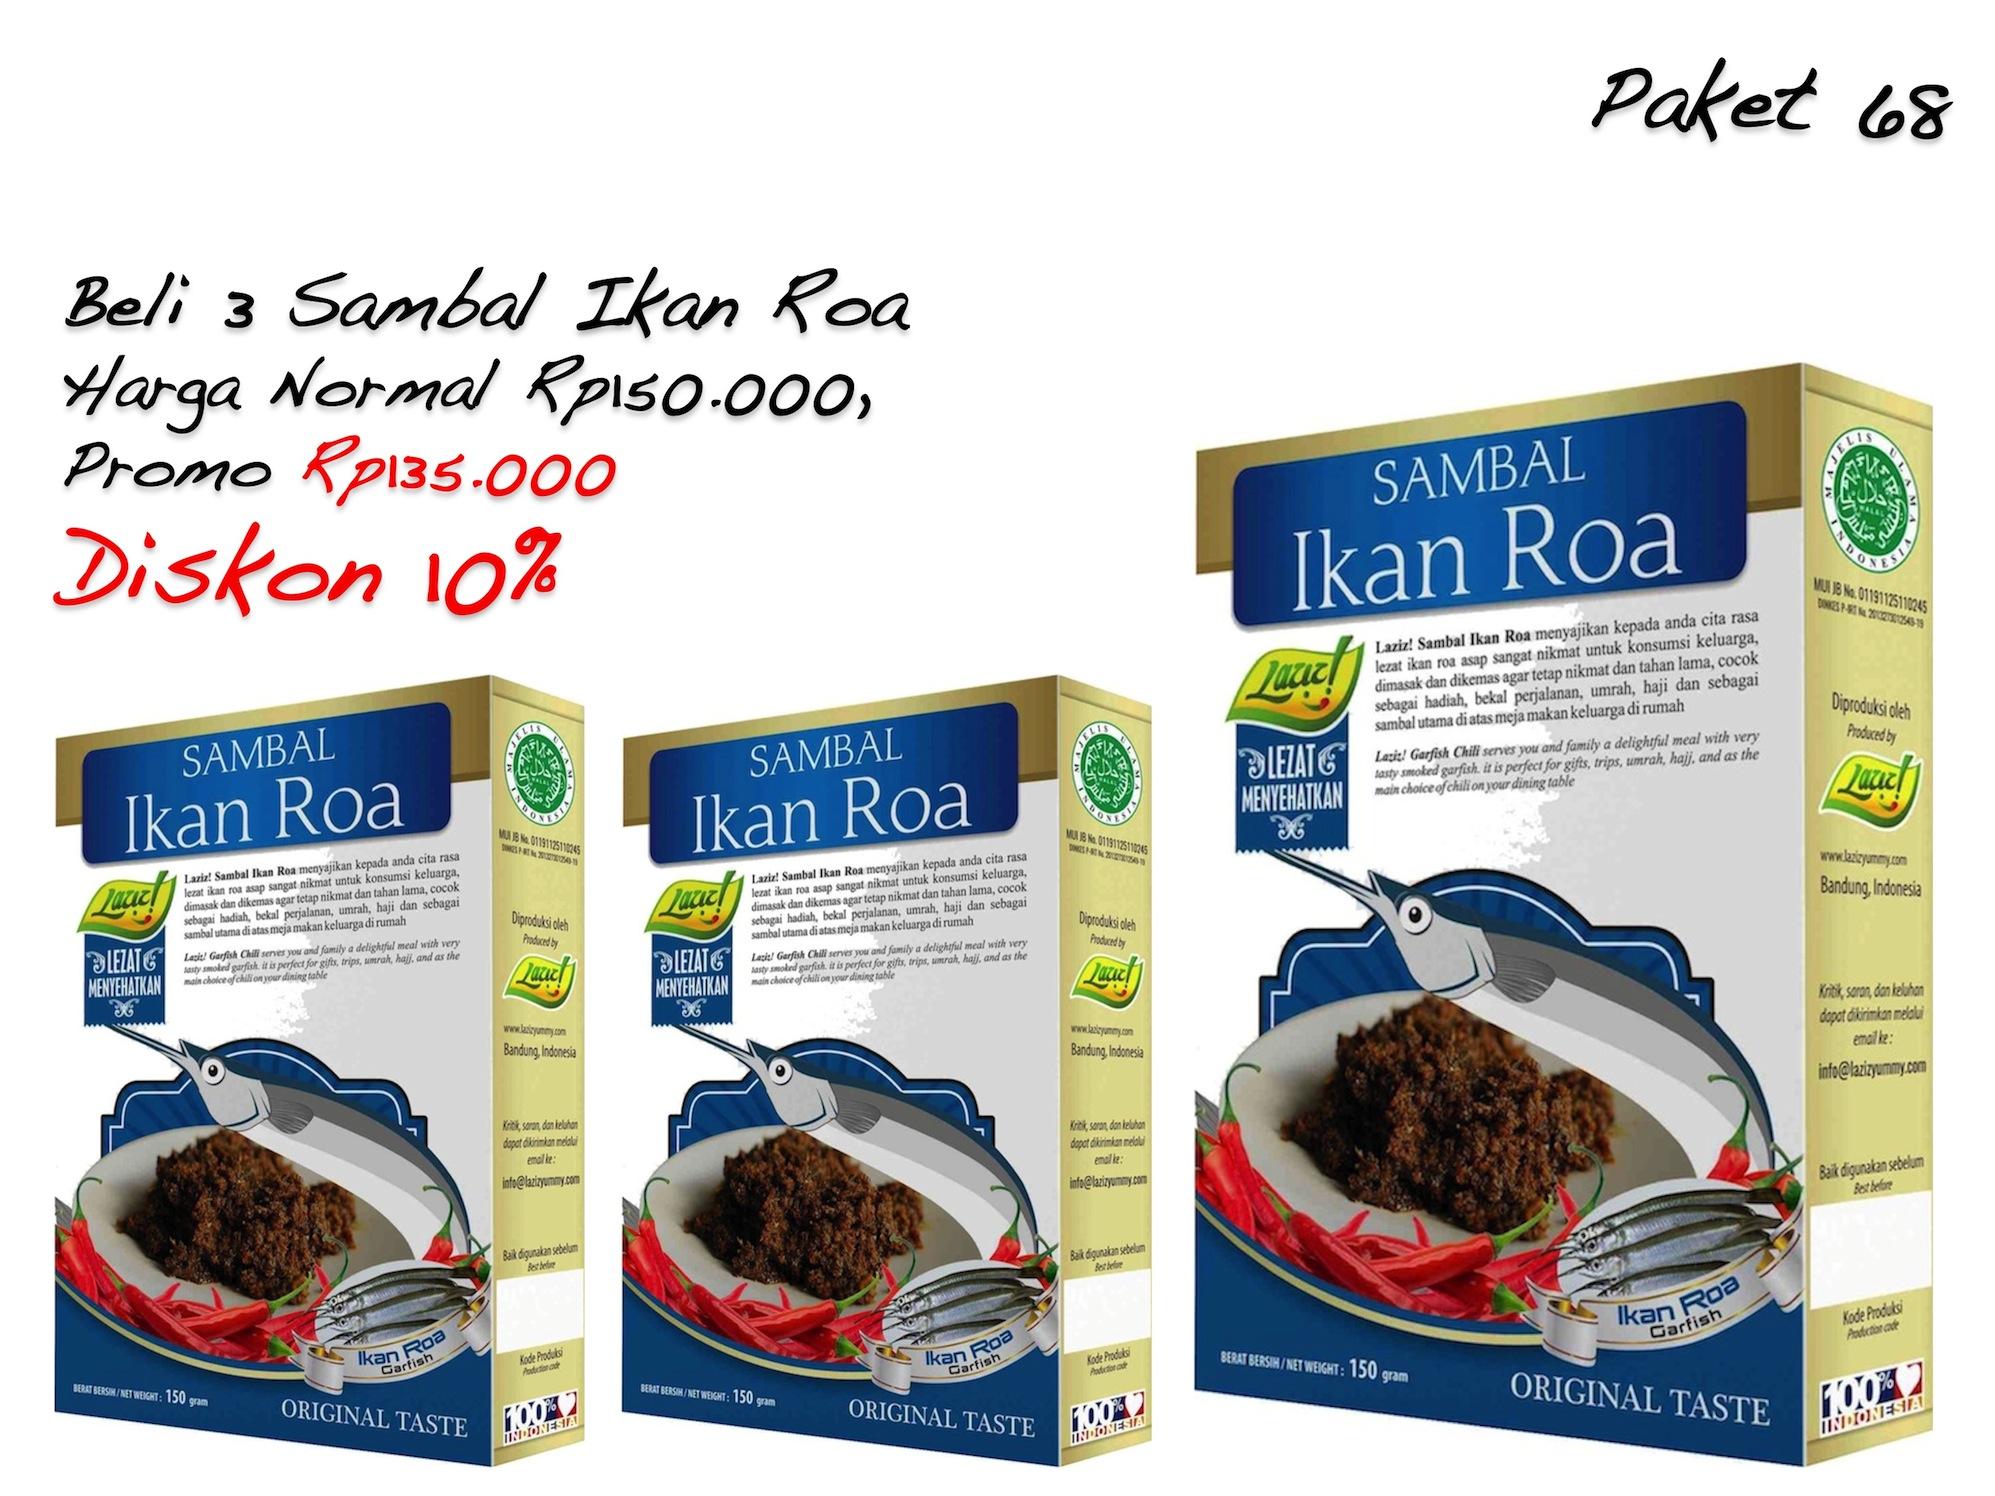 Jual Beli 3 Sambal Ikan Roa Laziz Food Tokopedia Source Sambal Cuk Paket .